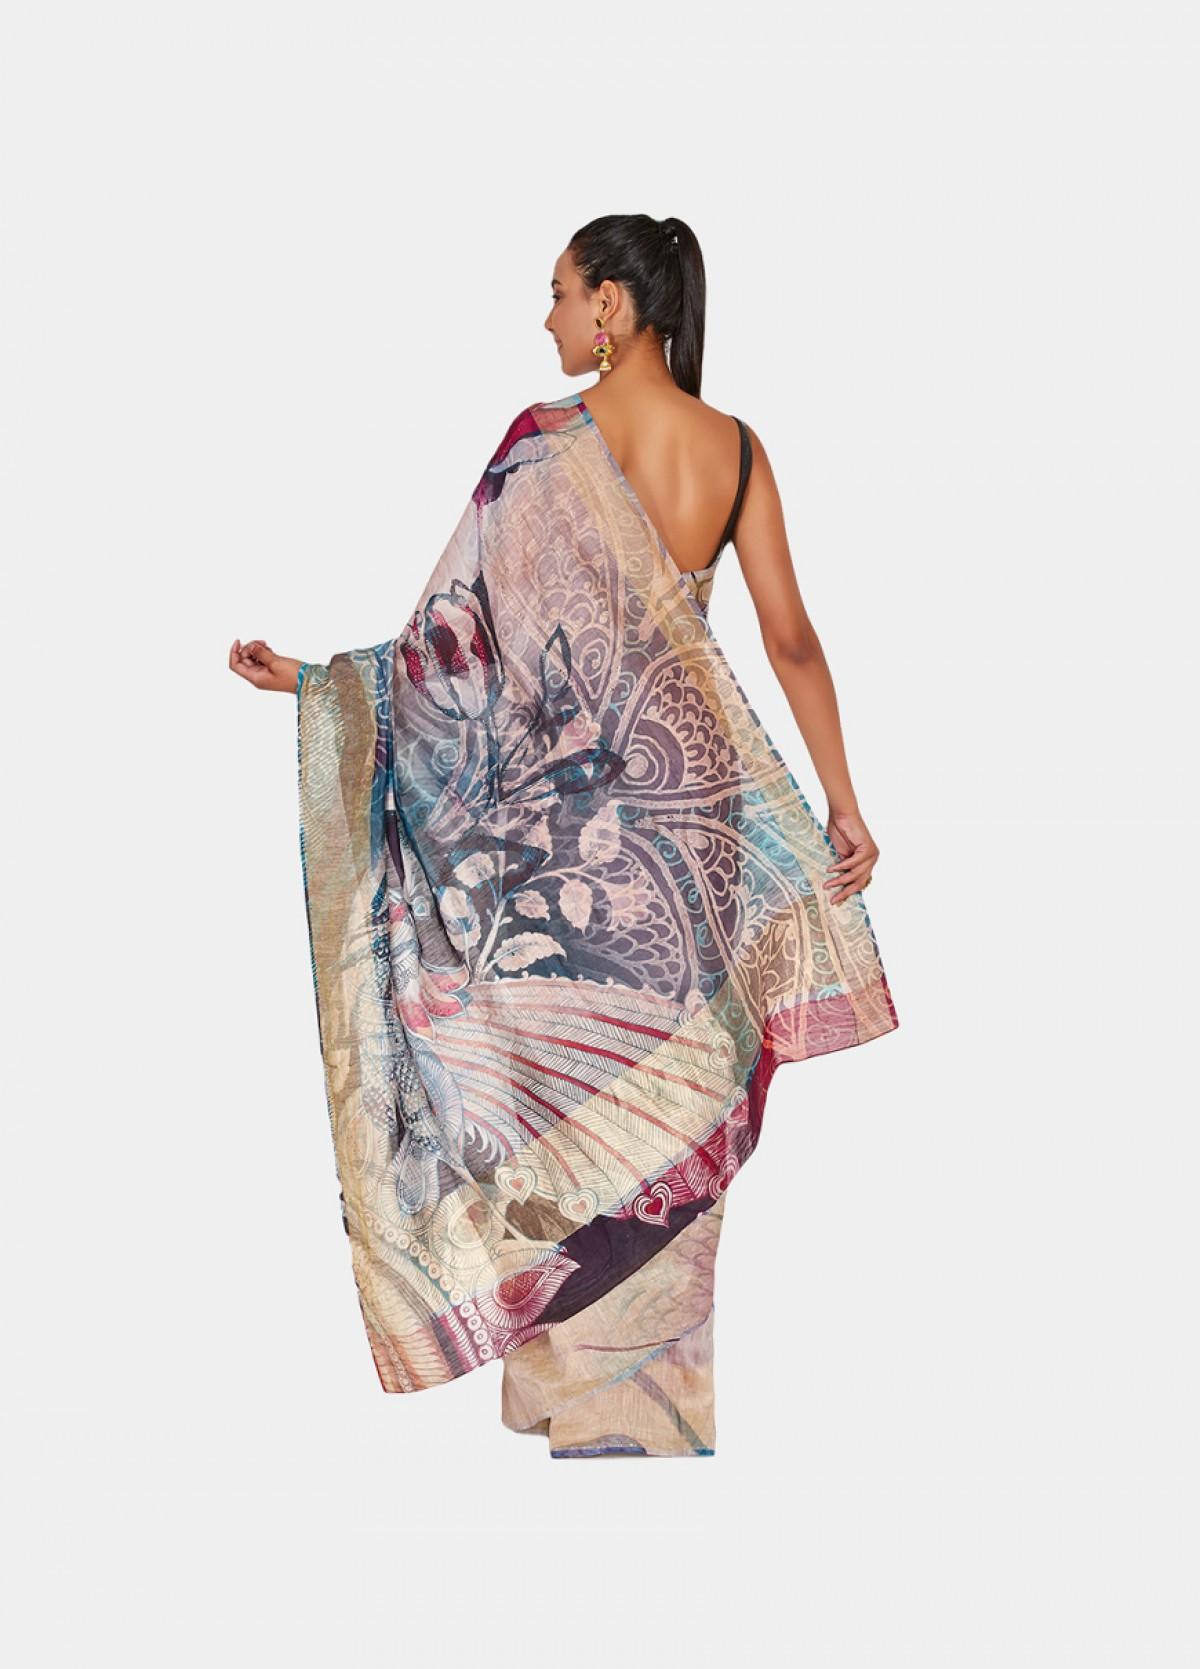 The Peacock Sari